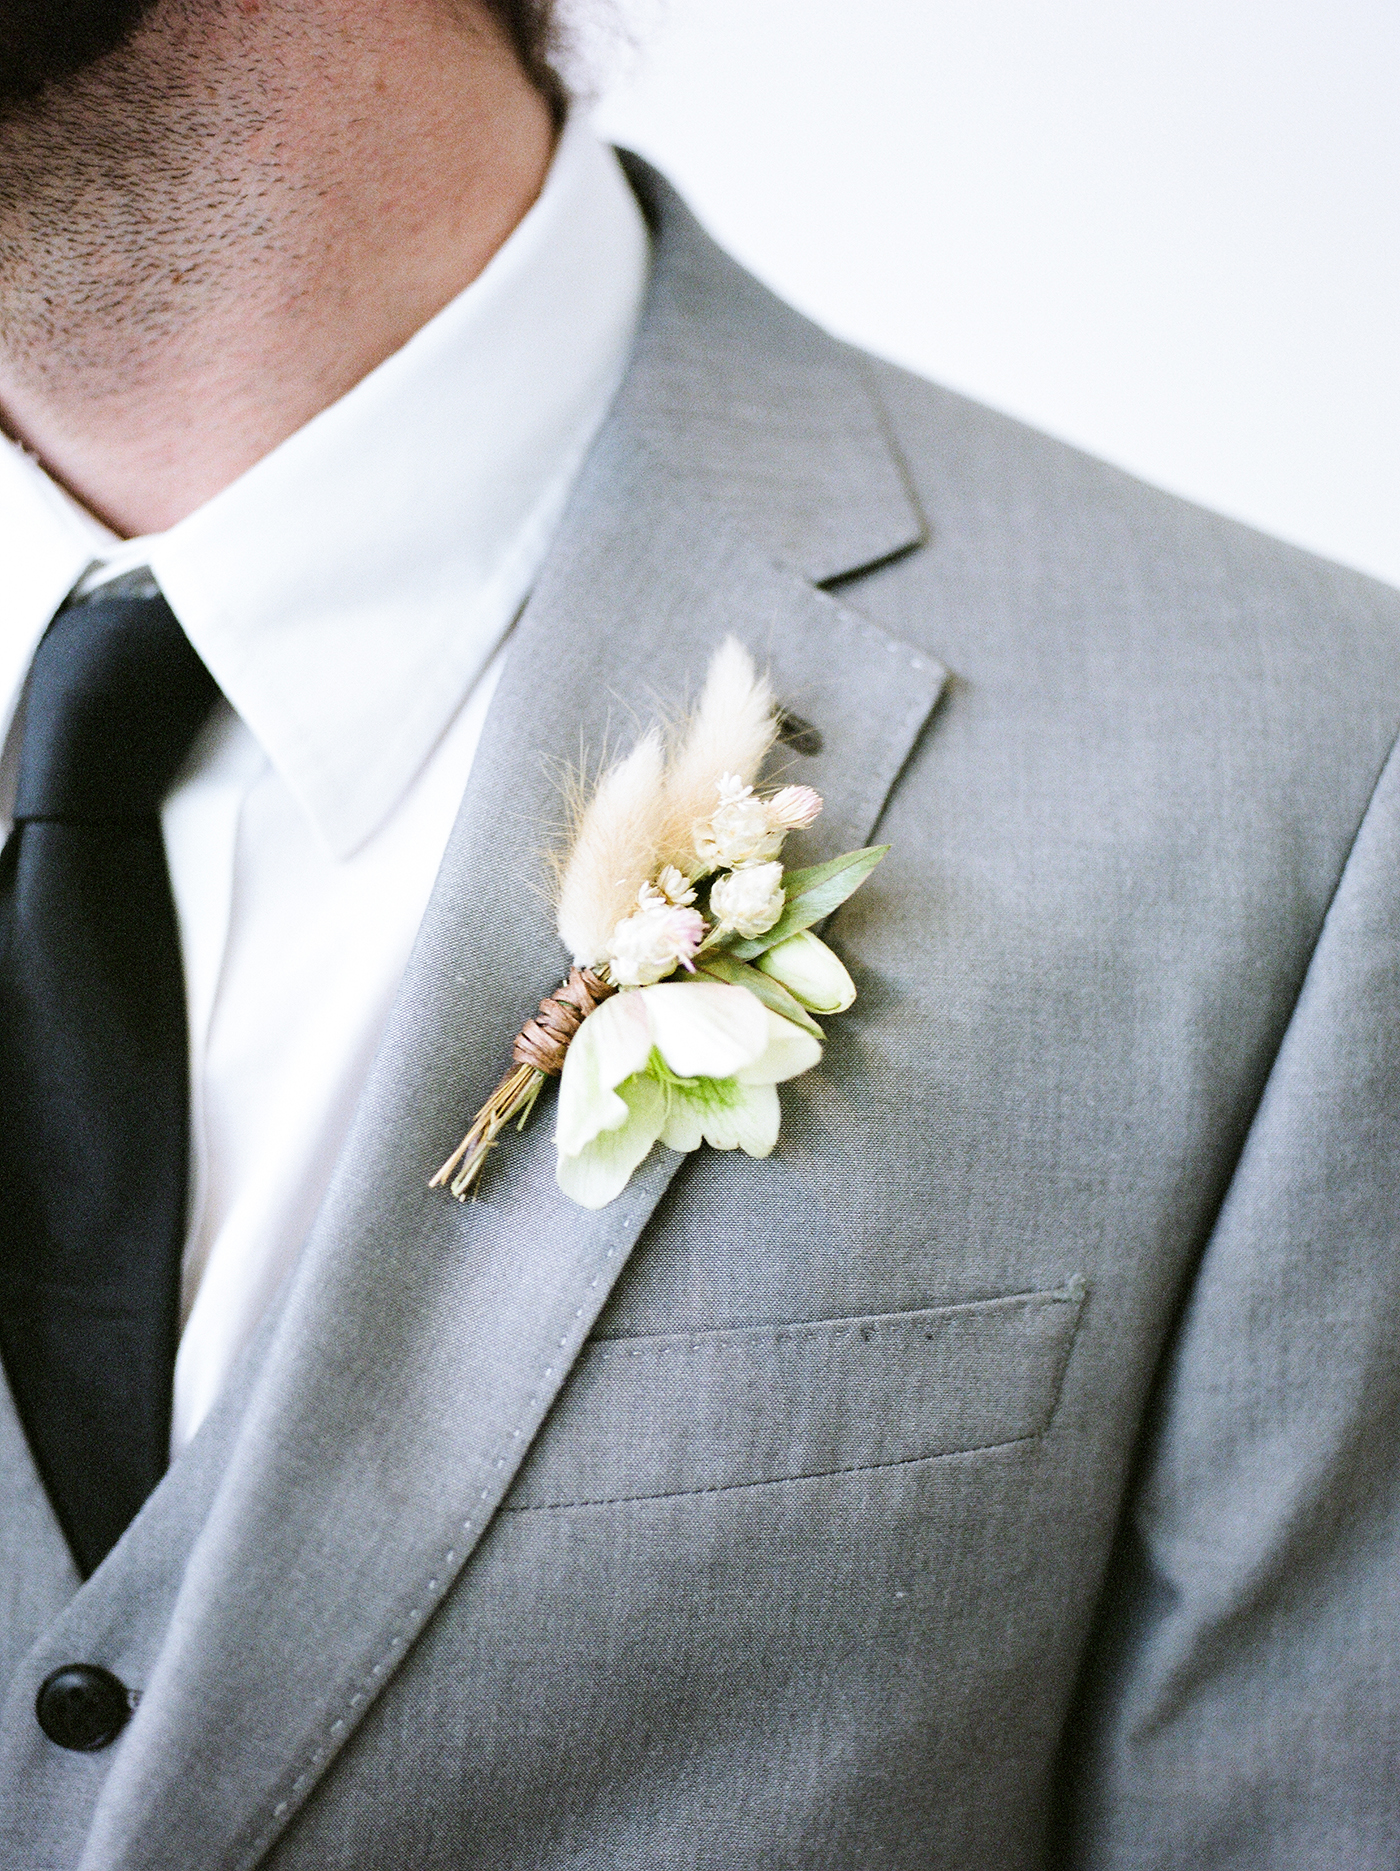 Wedding Floral Design Dallas - Olive Grove Design - Mimimalist Fall Wedding - 00080.jpg